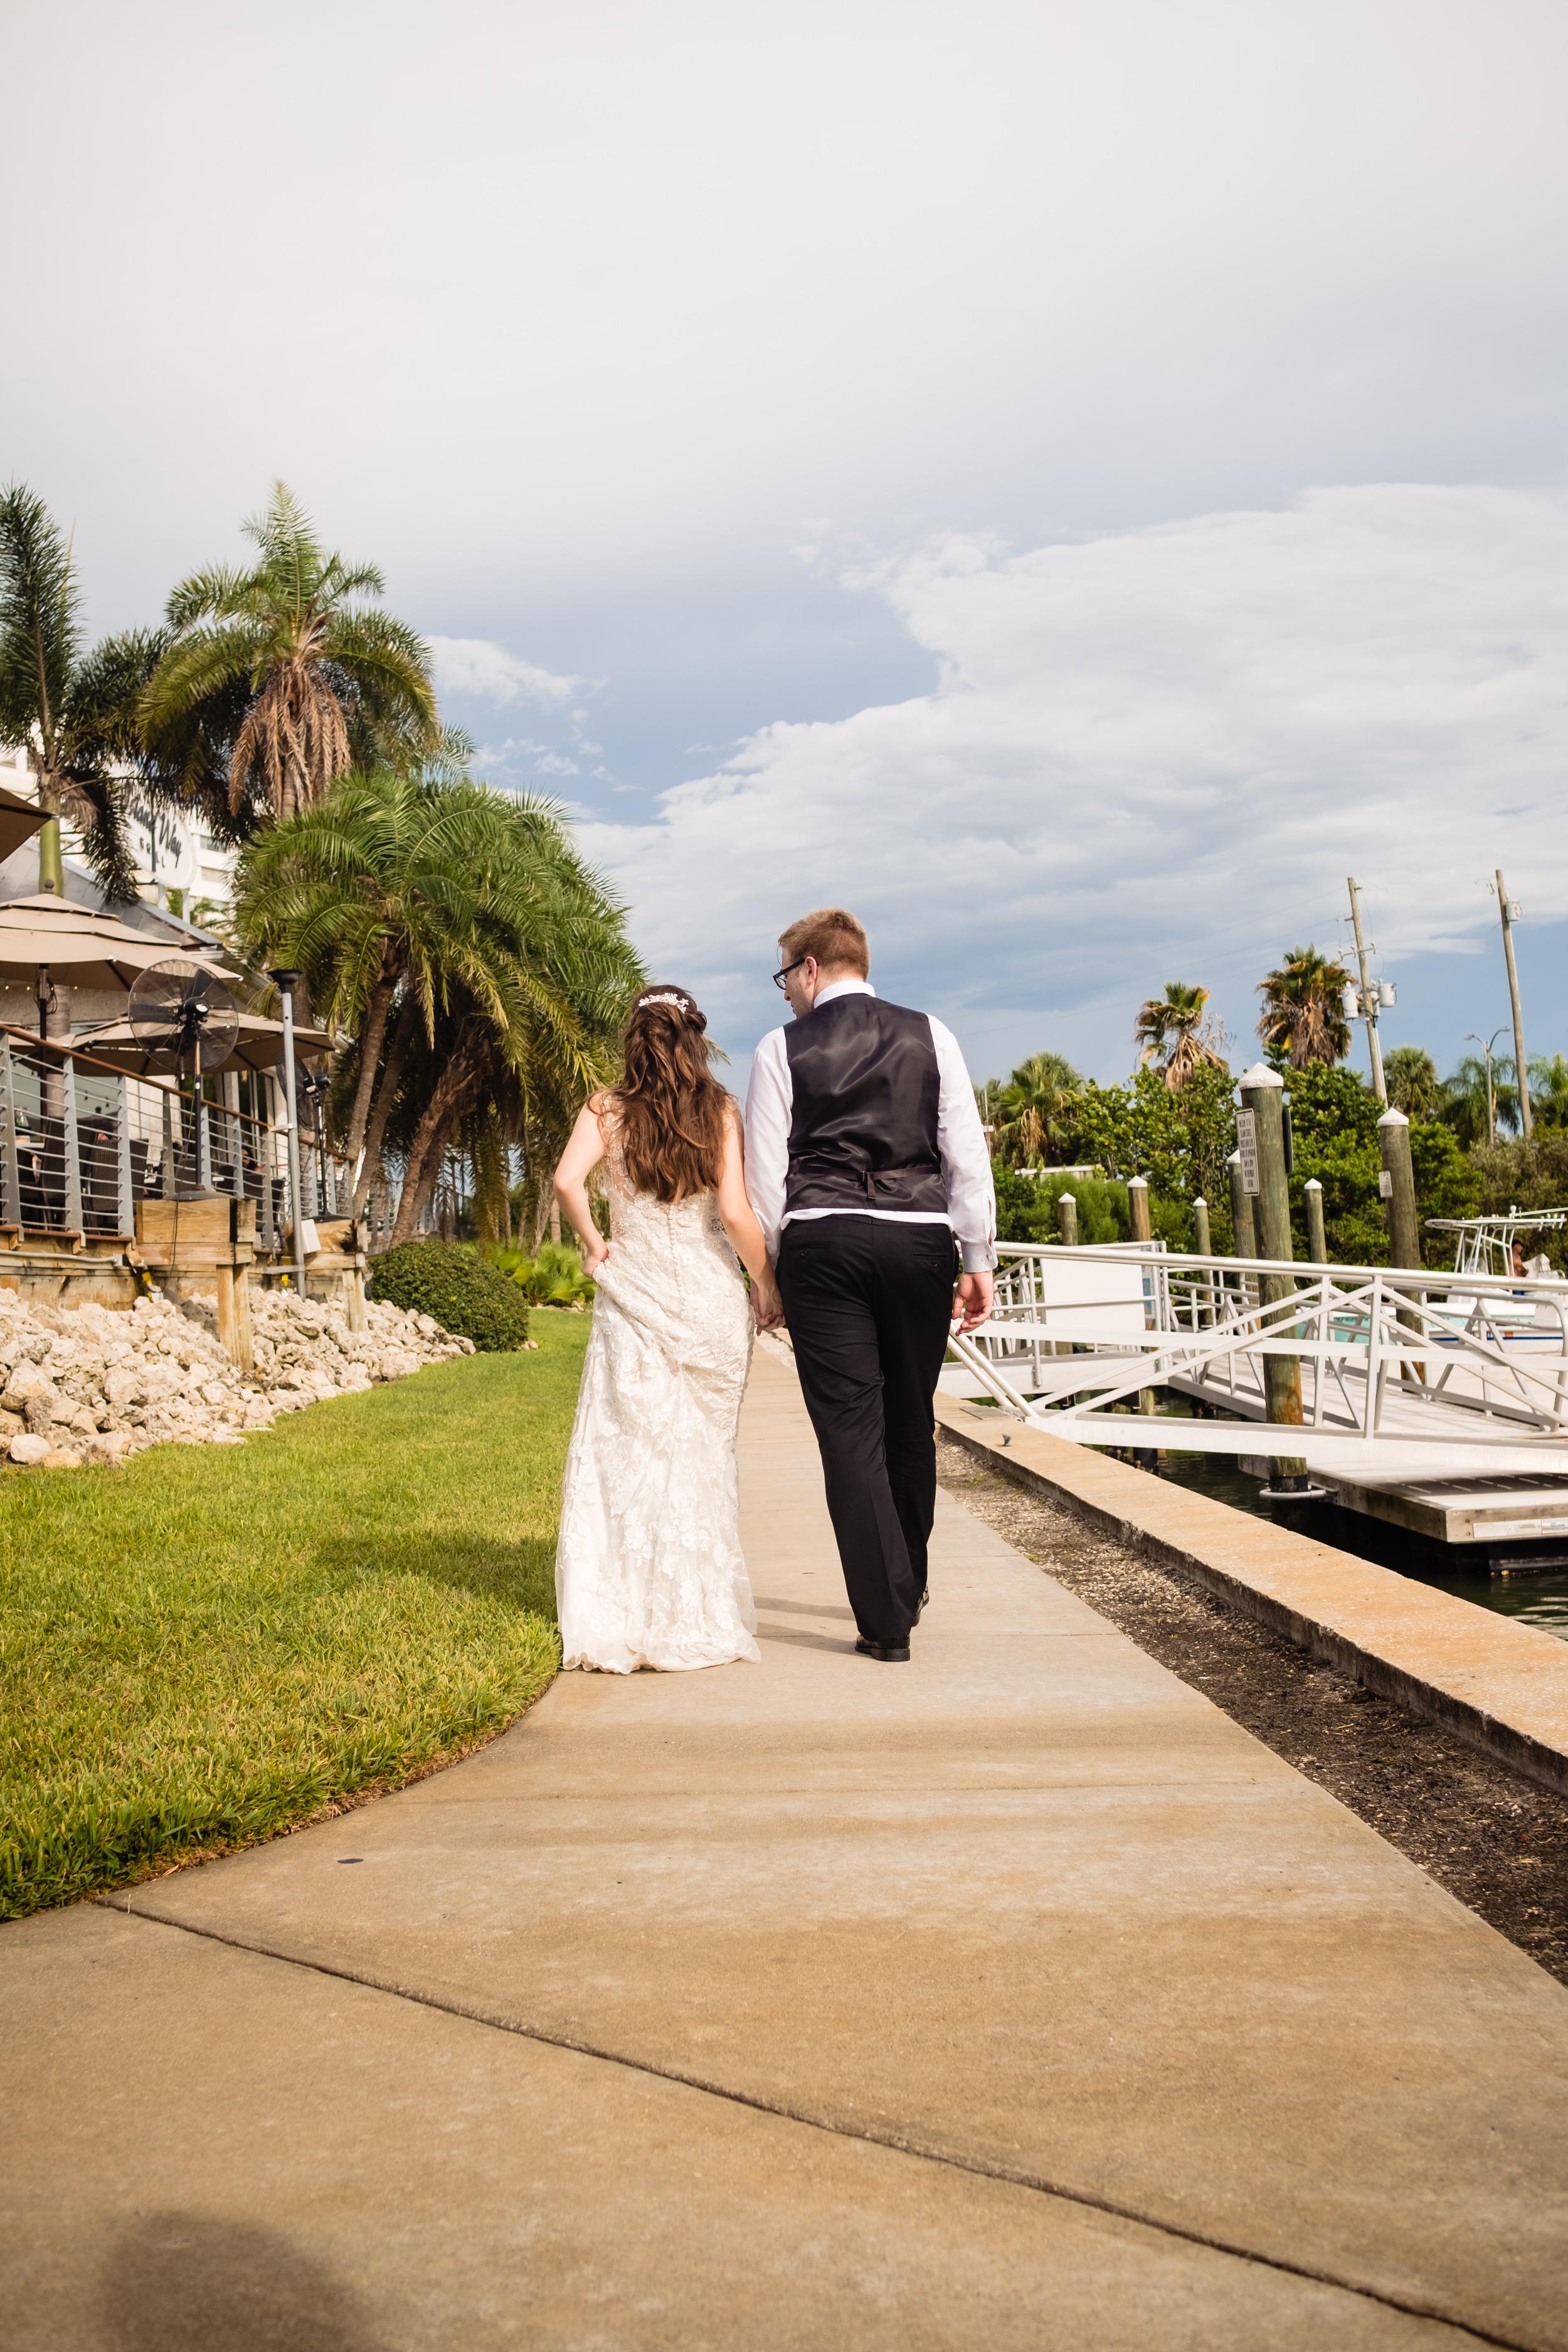 HAH_Zoe and Daniel_Clearwater Wedding_597_2018.jpg